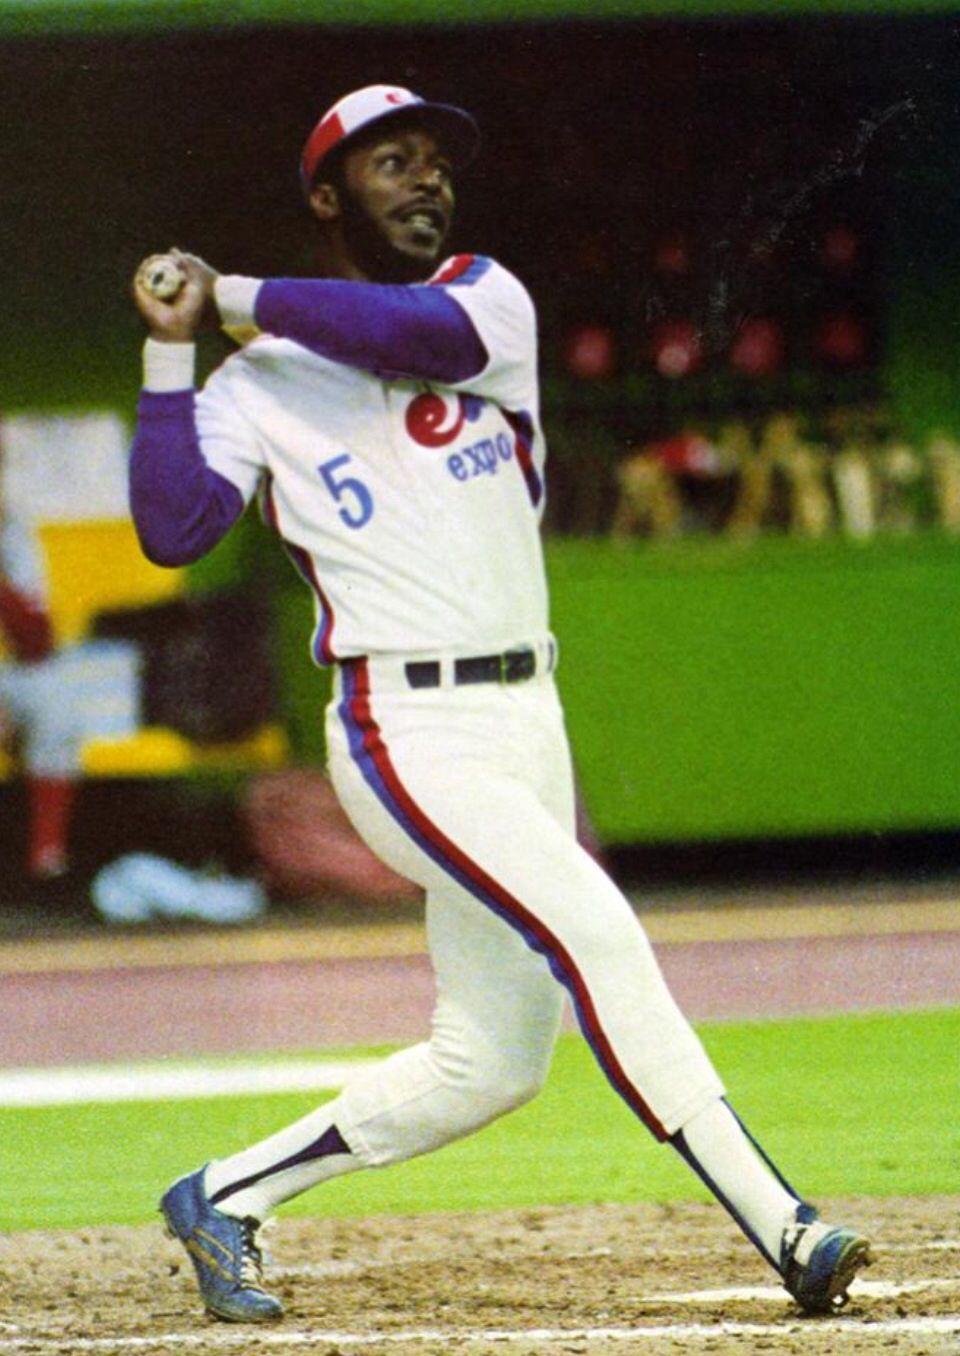 John Milner Montreal Expos Expos Baseball Major League Baseball Teams Mlb Teams